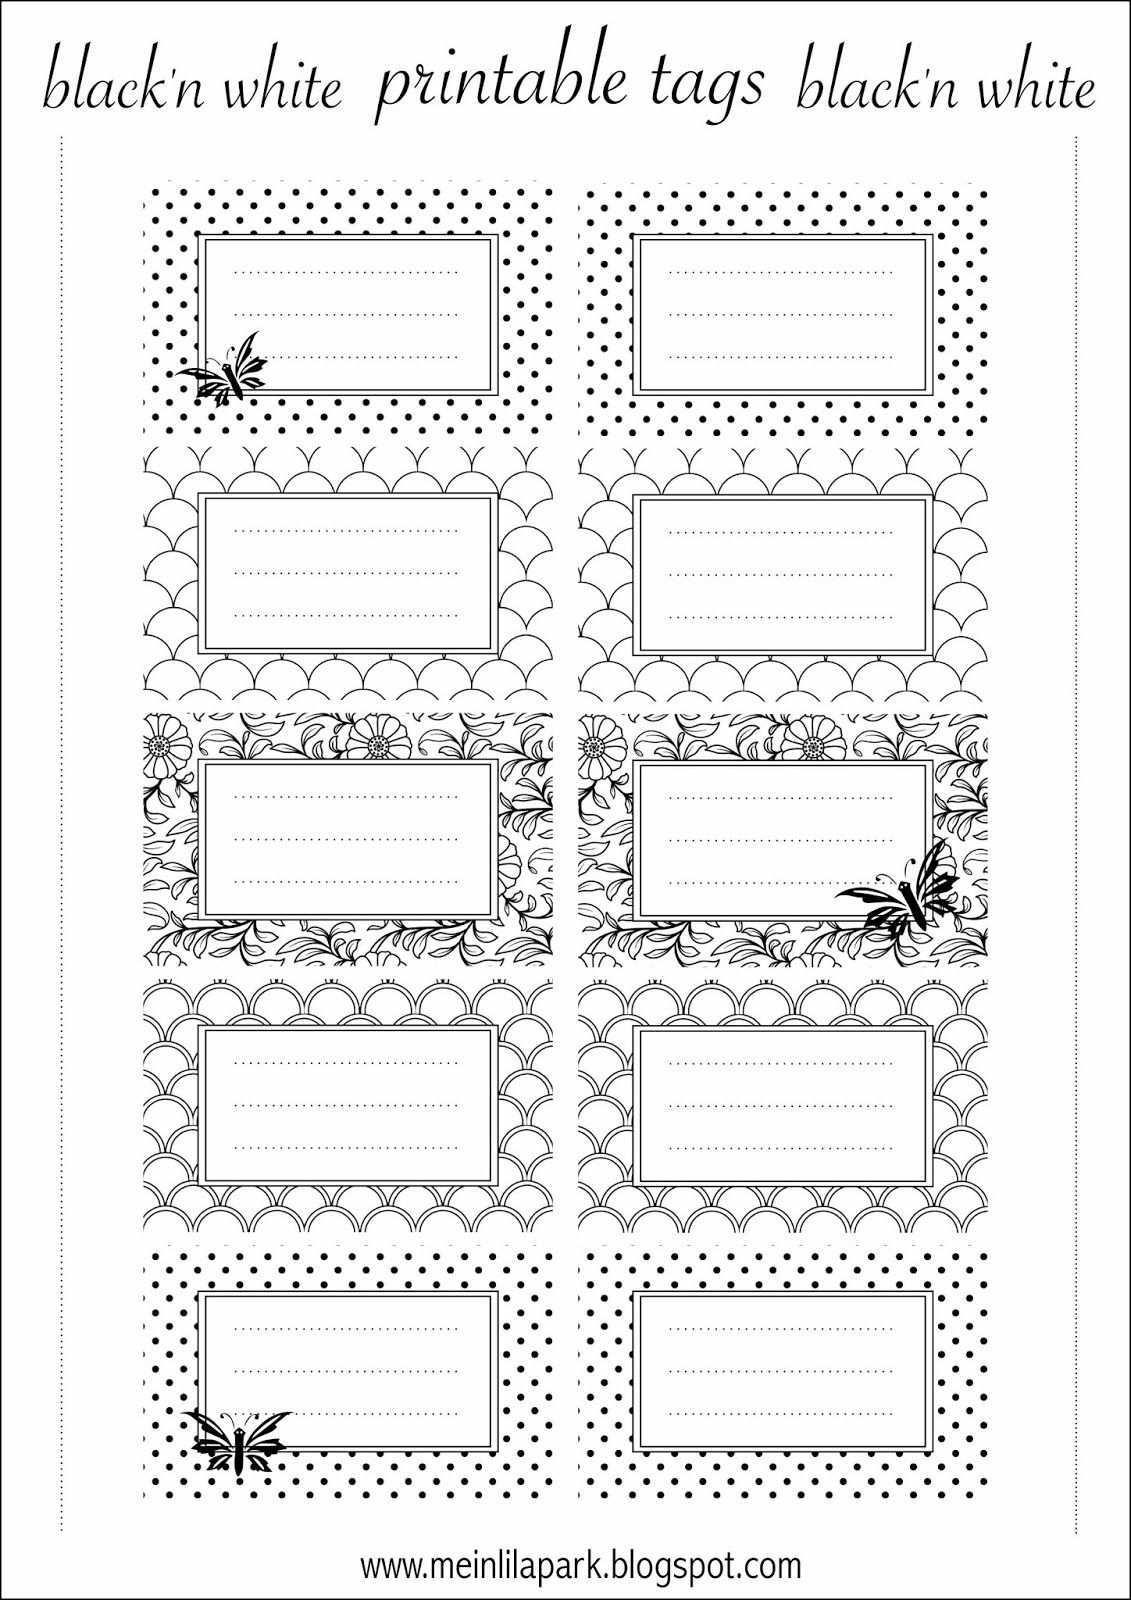 Free Printable Tags Black And White Ausdruckbare Etiketten Freebie Meinlilapark Etiketten Selber Drucken Etiketten Drucken Etiketten Basteln